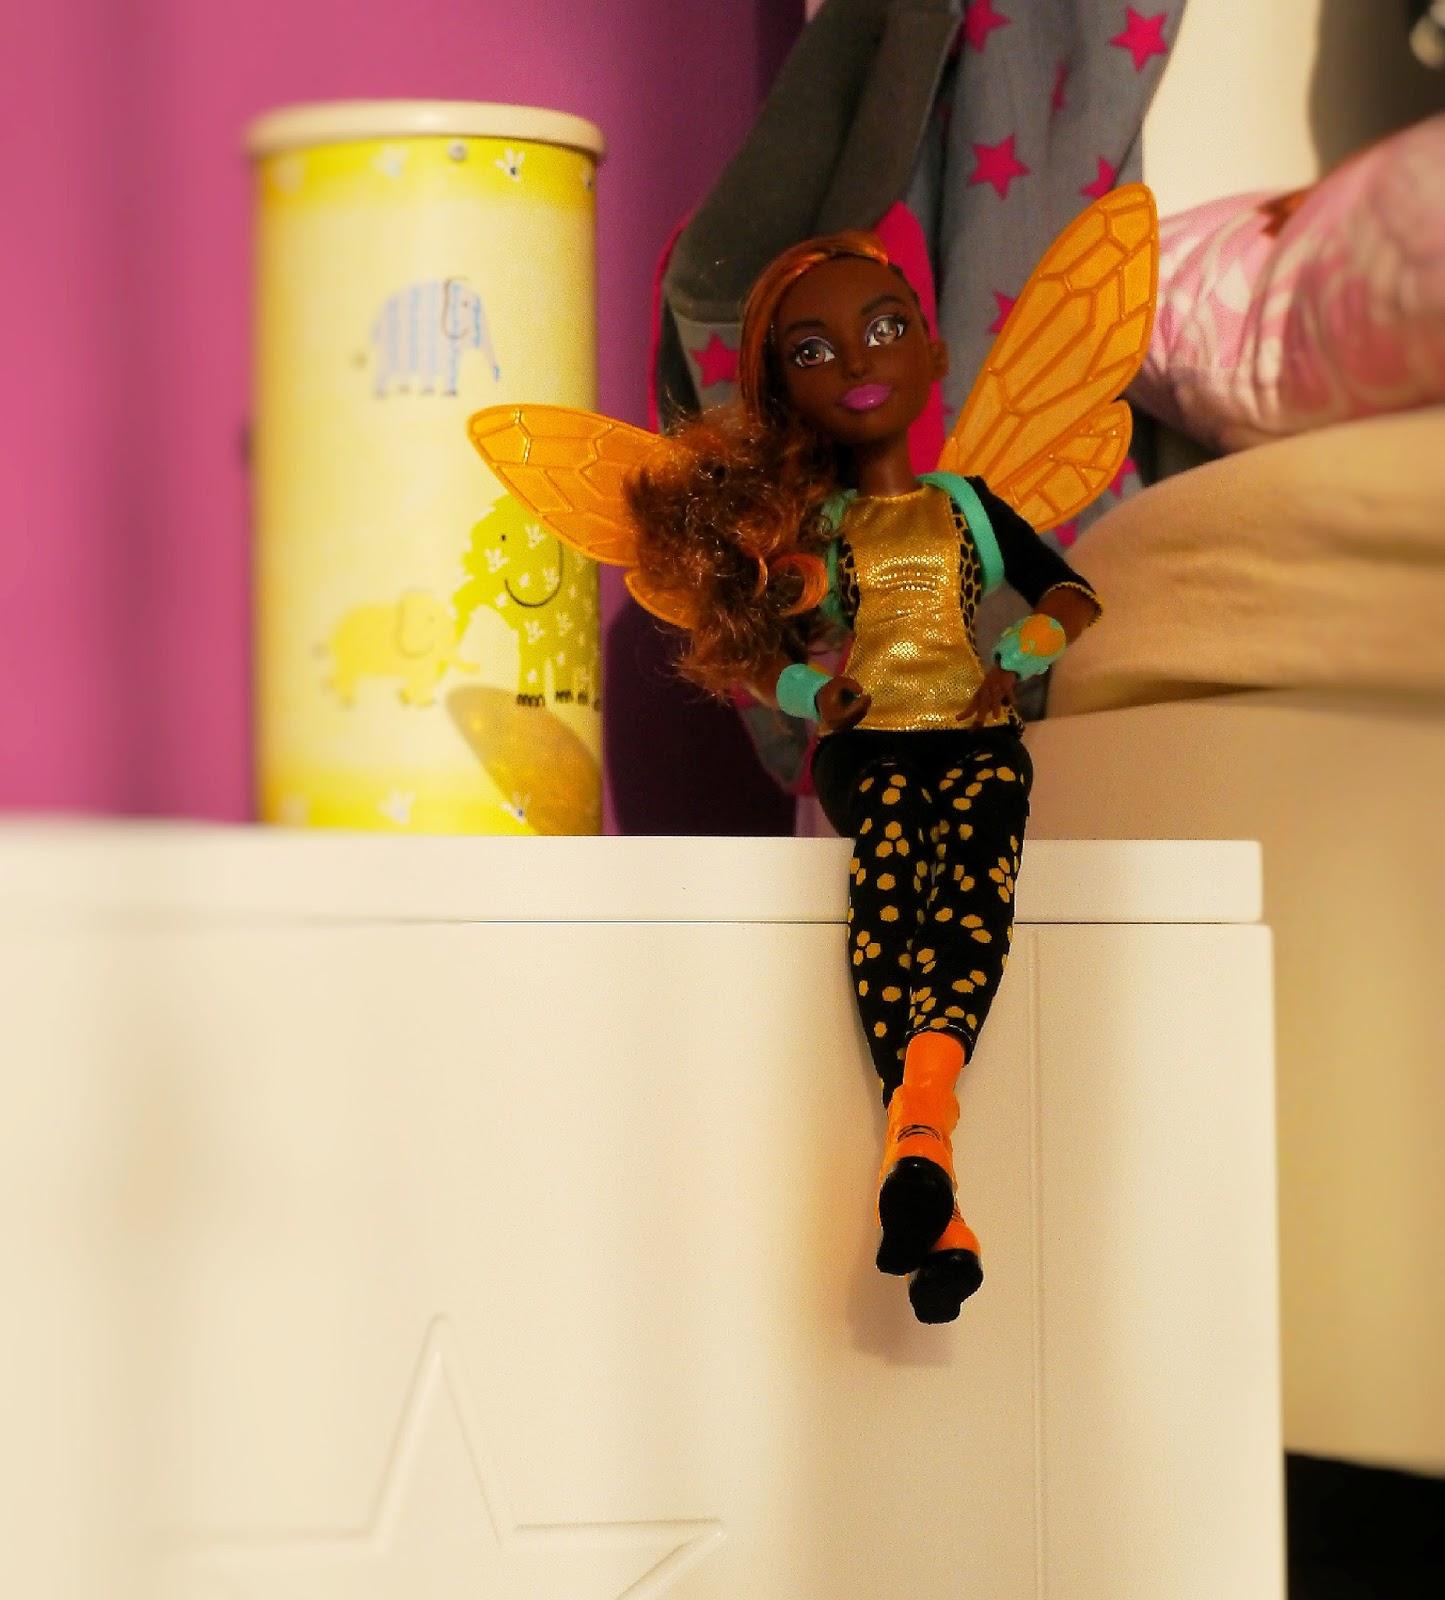 Superheldin Bumblebee